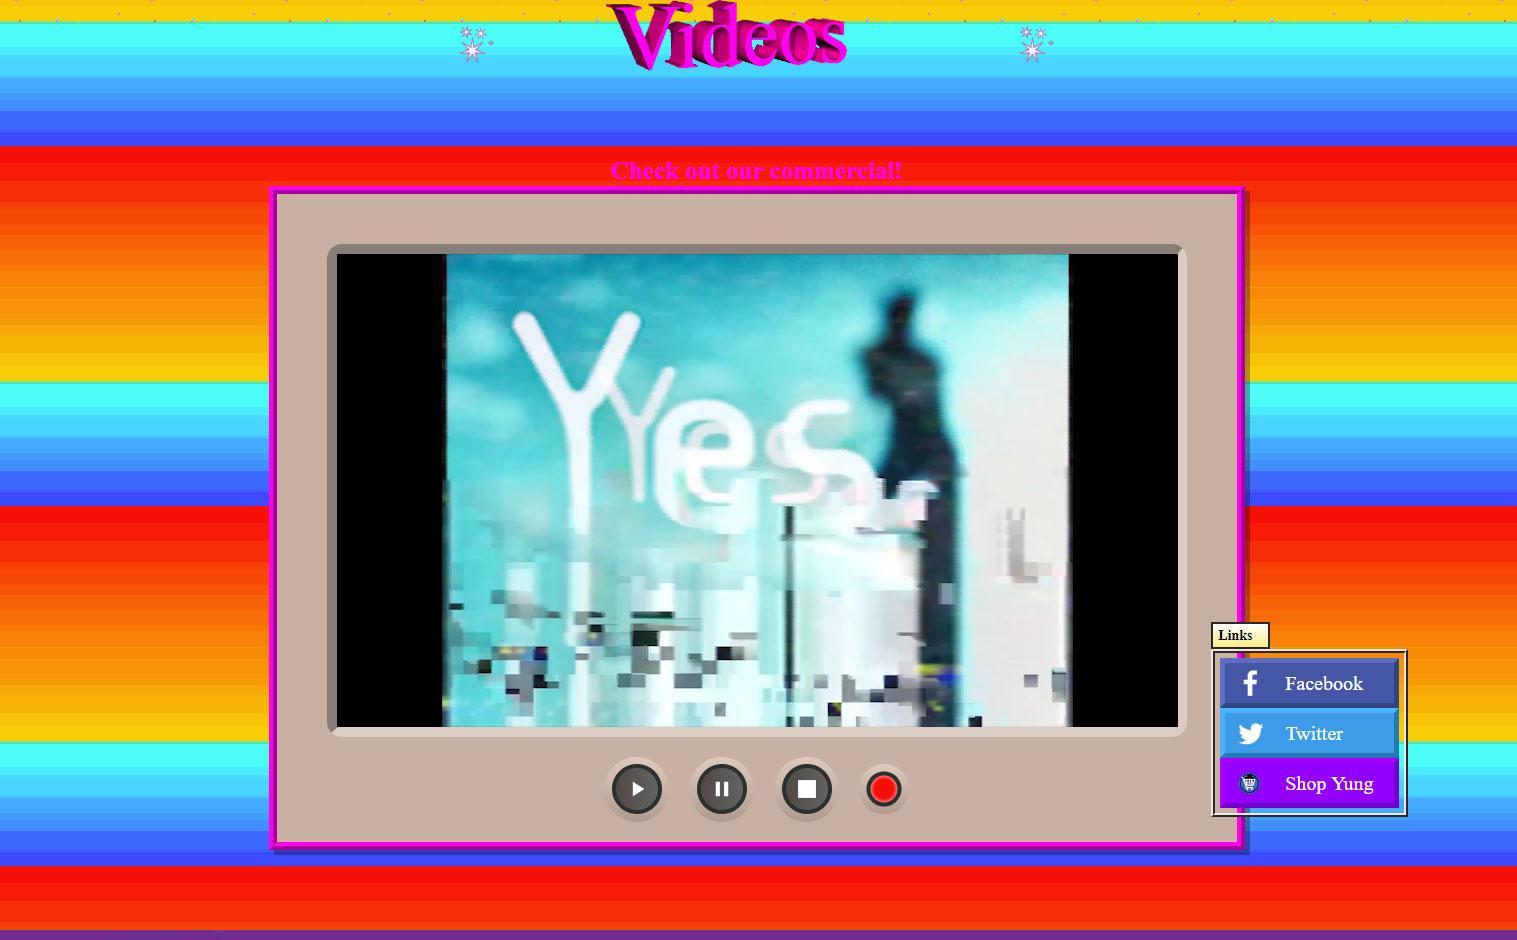 Adidas Yung Series: videos